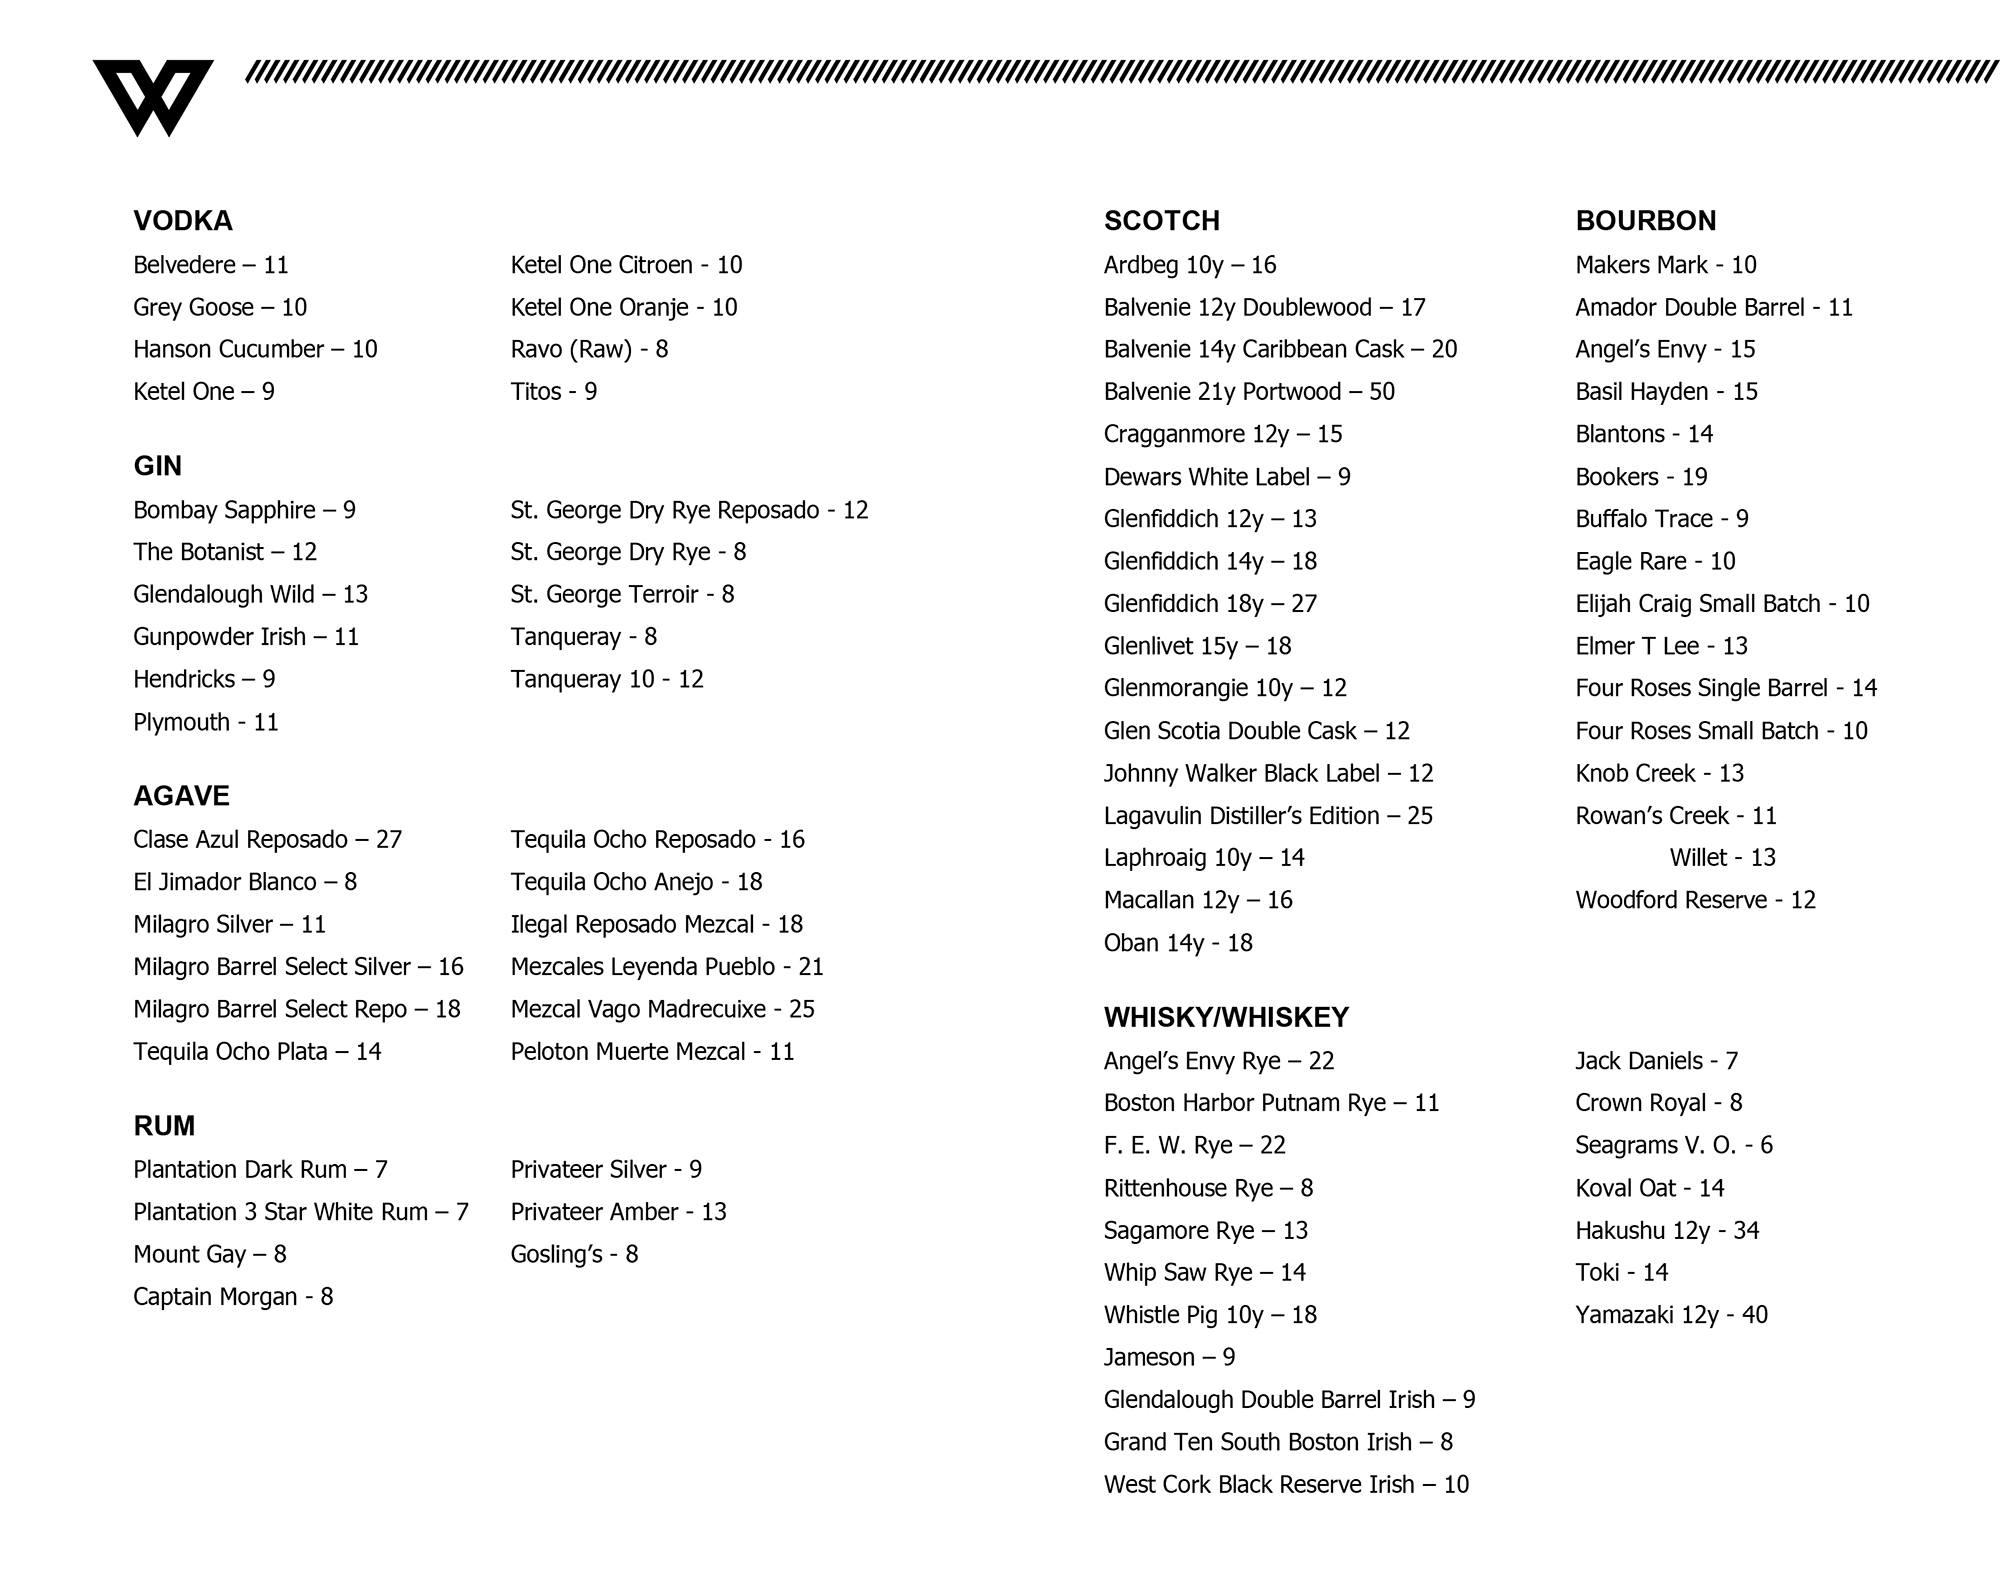 The Wellington spirits list